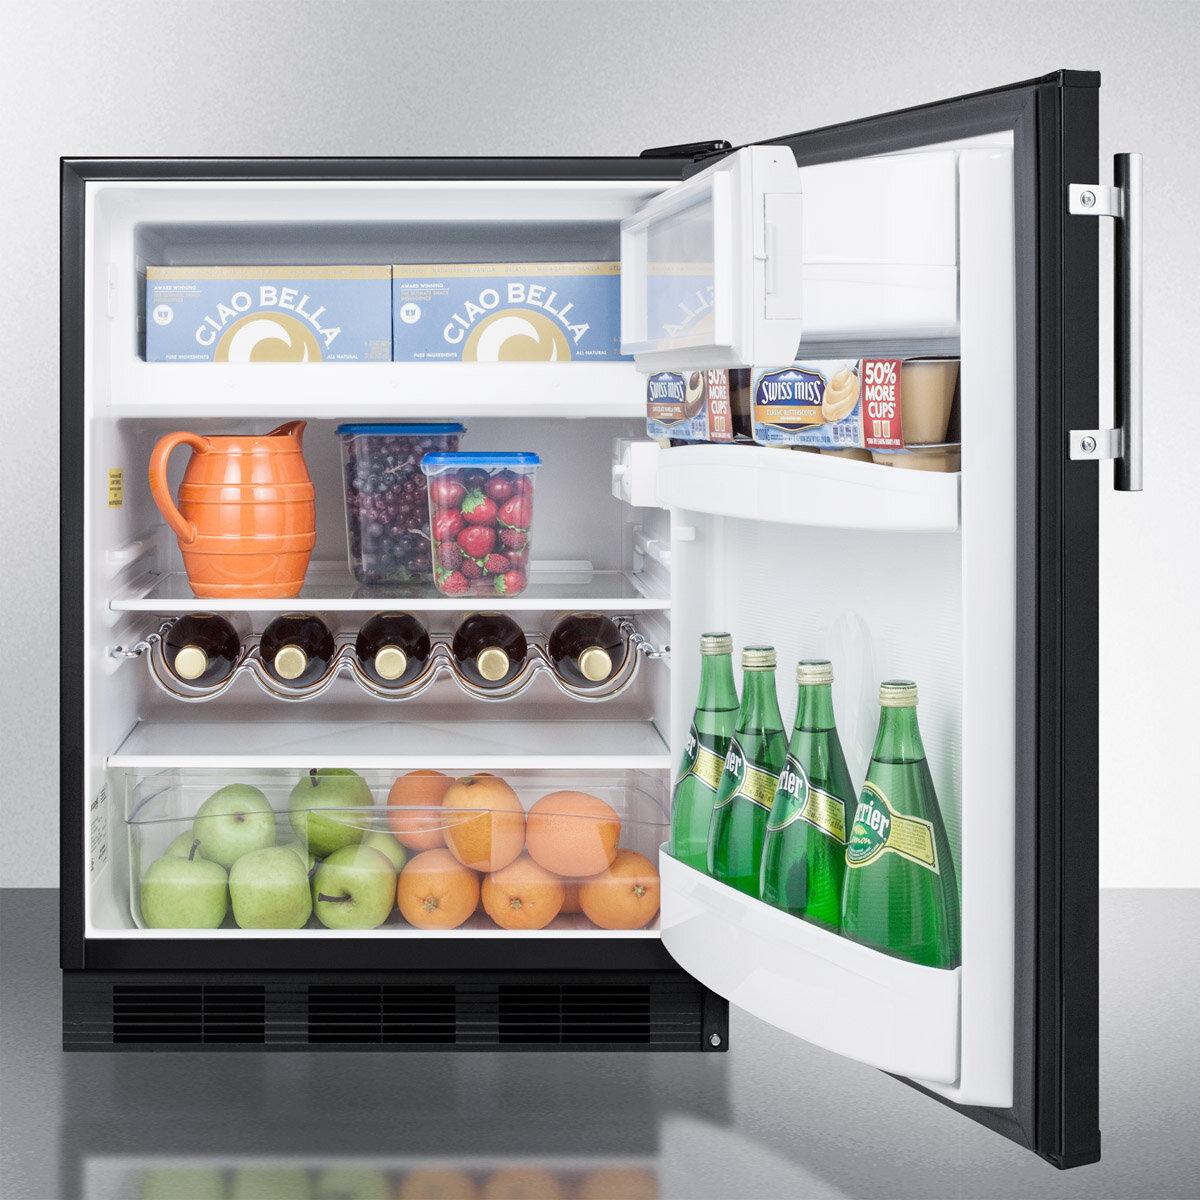 Summit Liance 24 Inch 5 Cu Ft Convertible Undercounter Refrigerator With Freezer Wayfair